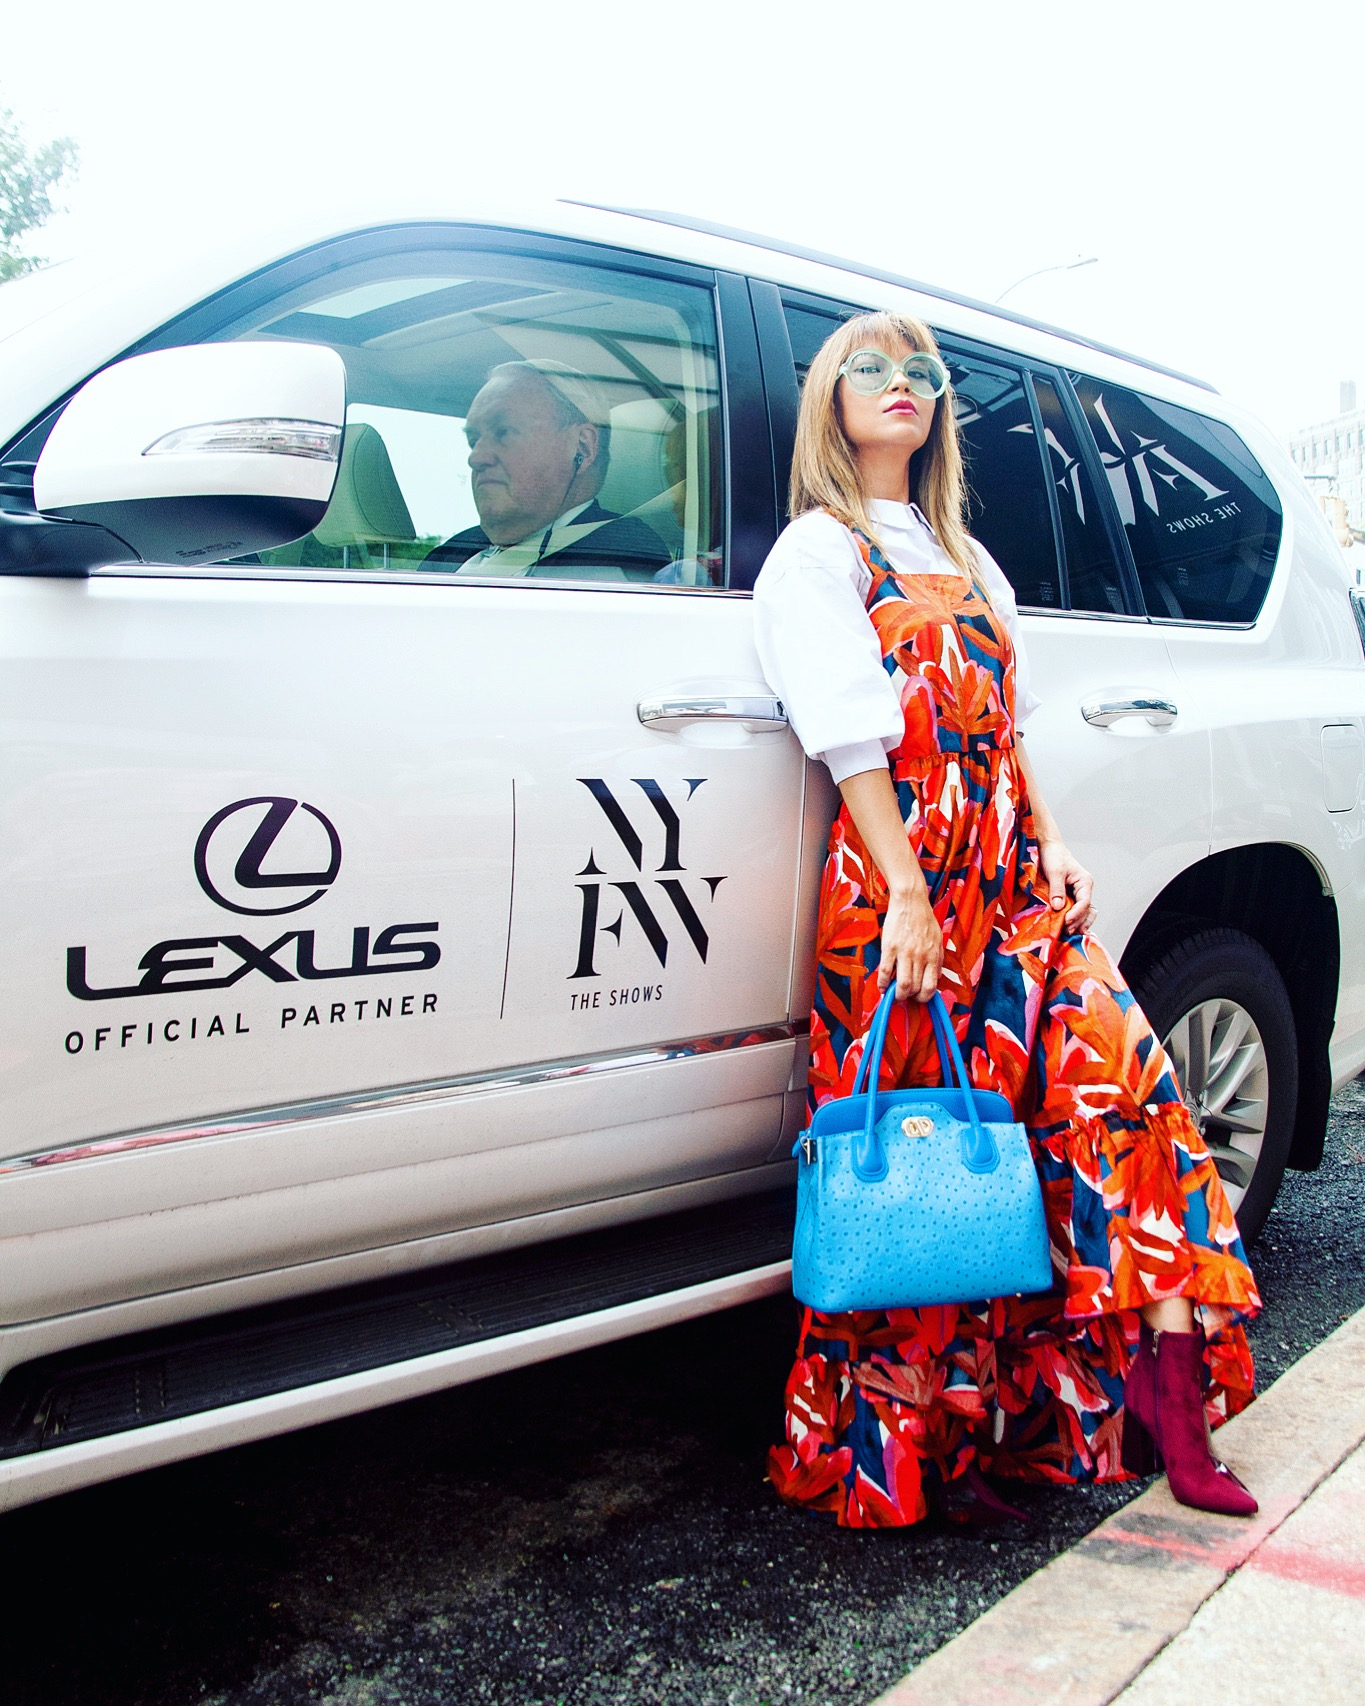 NYFW Lexus Partner